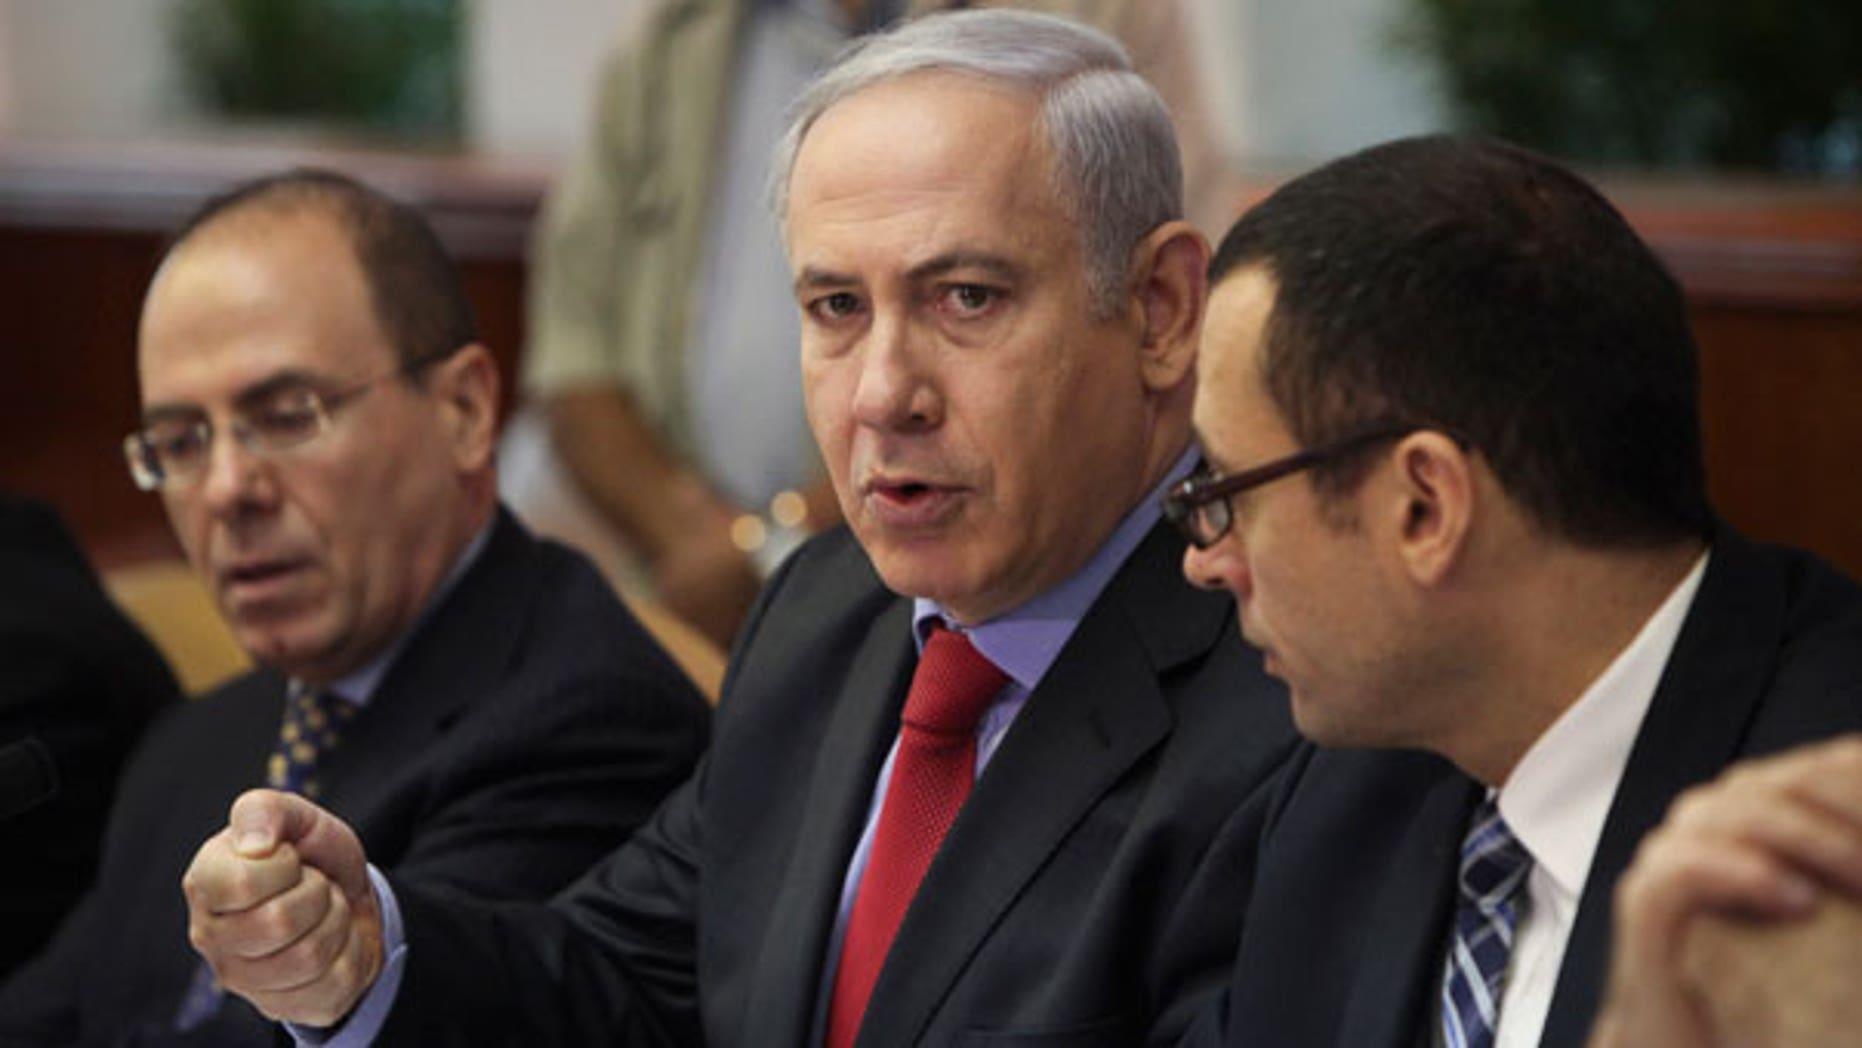 Sept. 18: Israeli Prime Minister Benjamin Netanyahu, center, talks during a weekly cabinet meeting in Jerusalem.